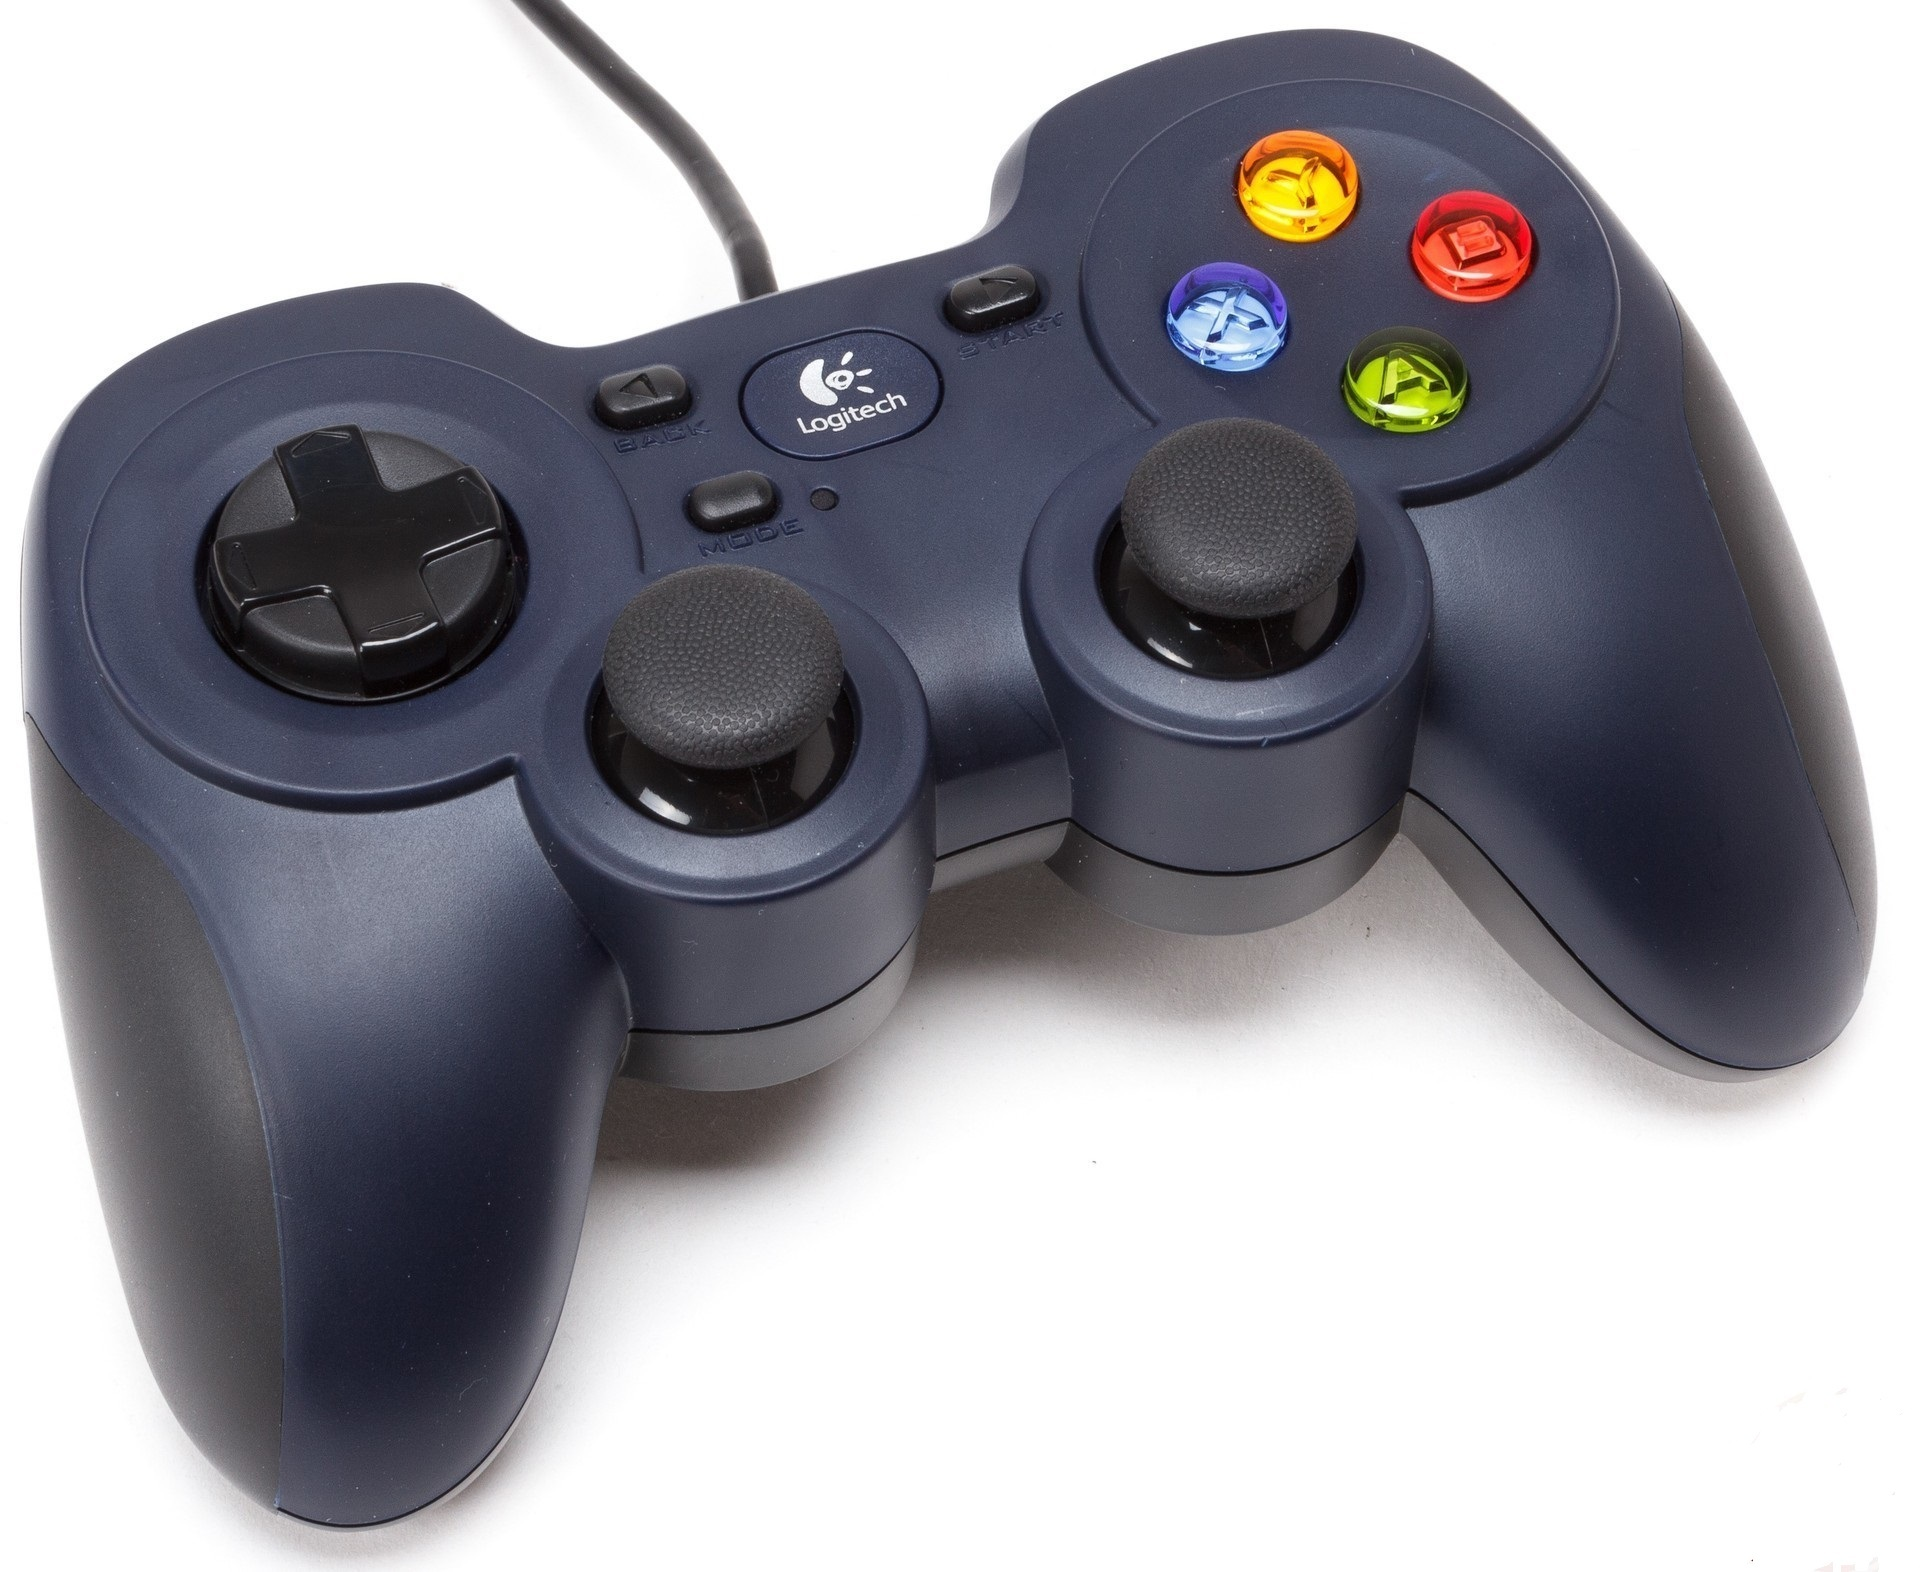 tay cầm chơi game logitech